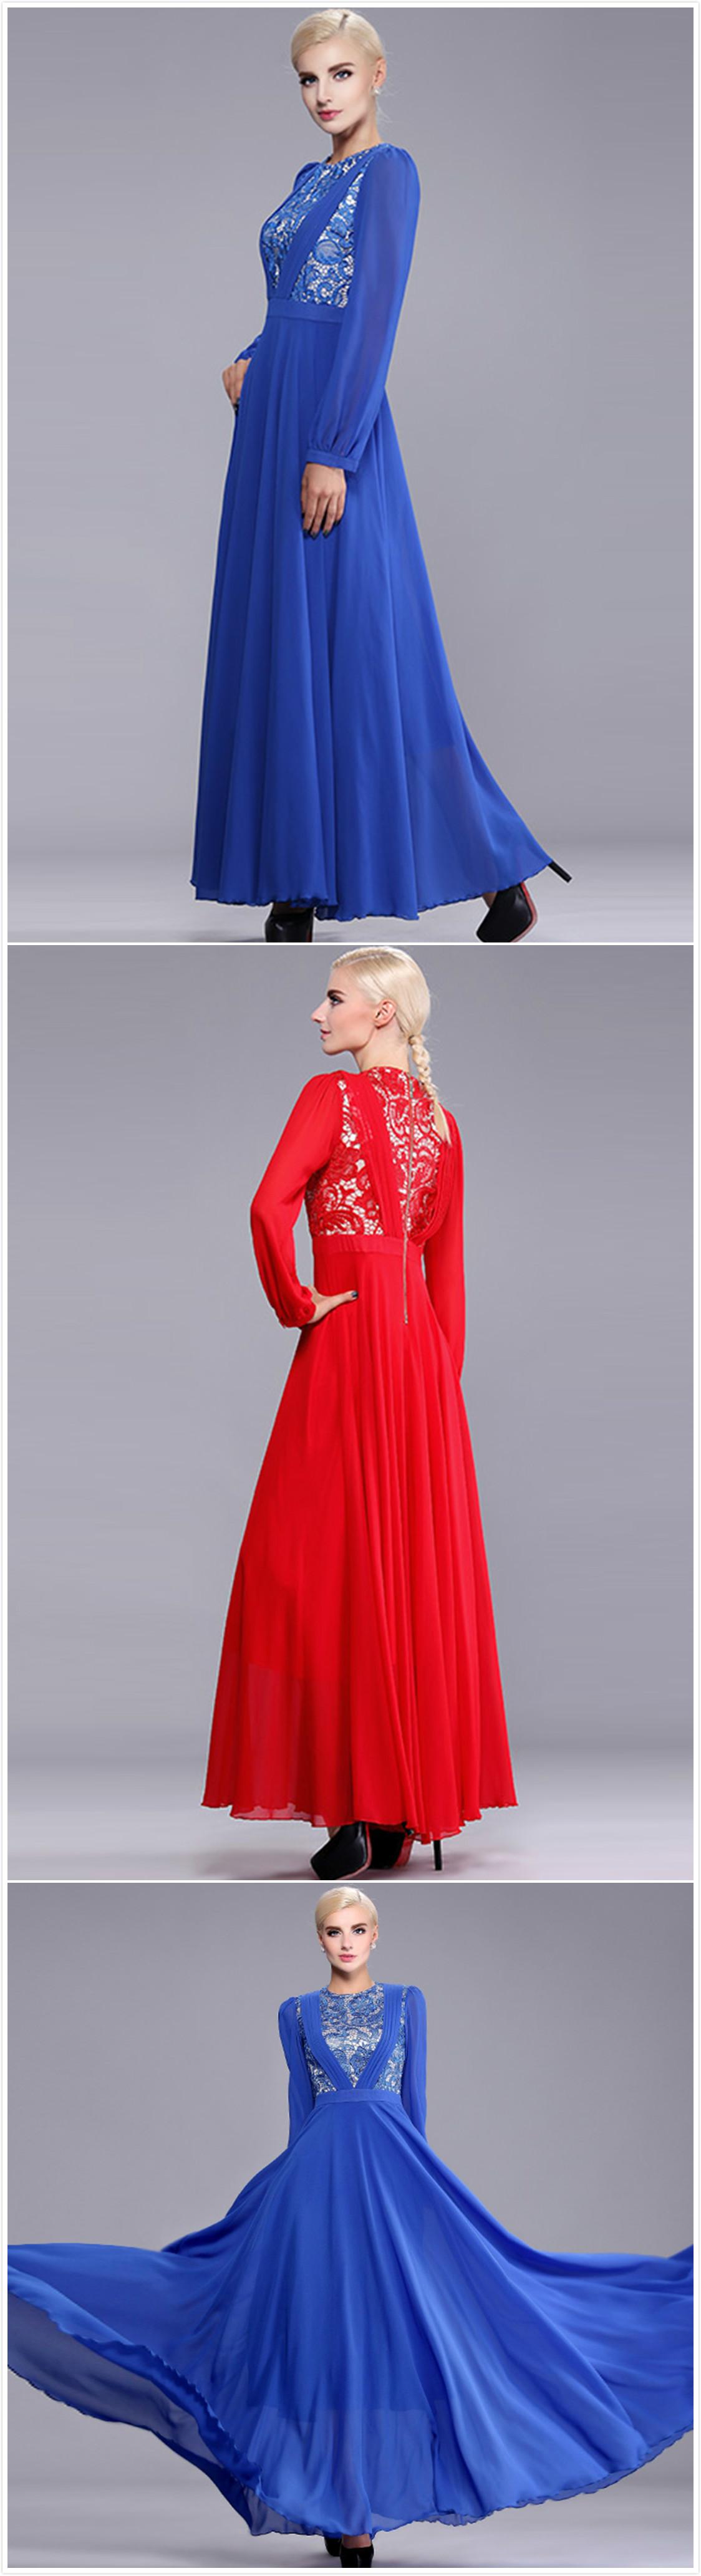 Long sleeve lace chiffon evening prom bridesmaid dress lace prom